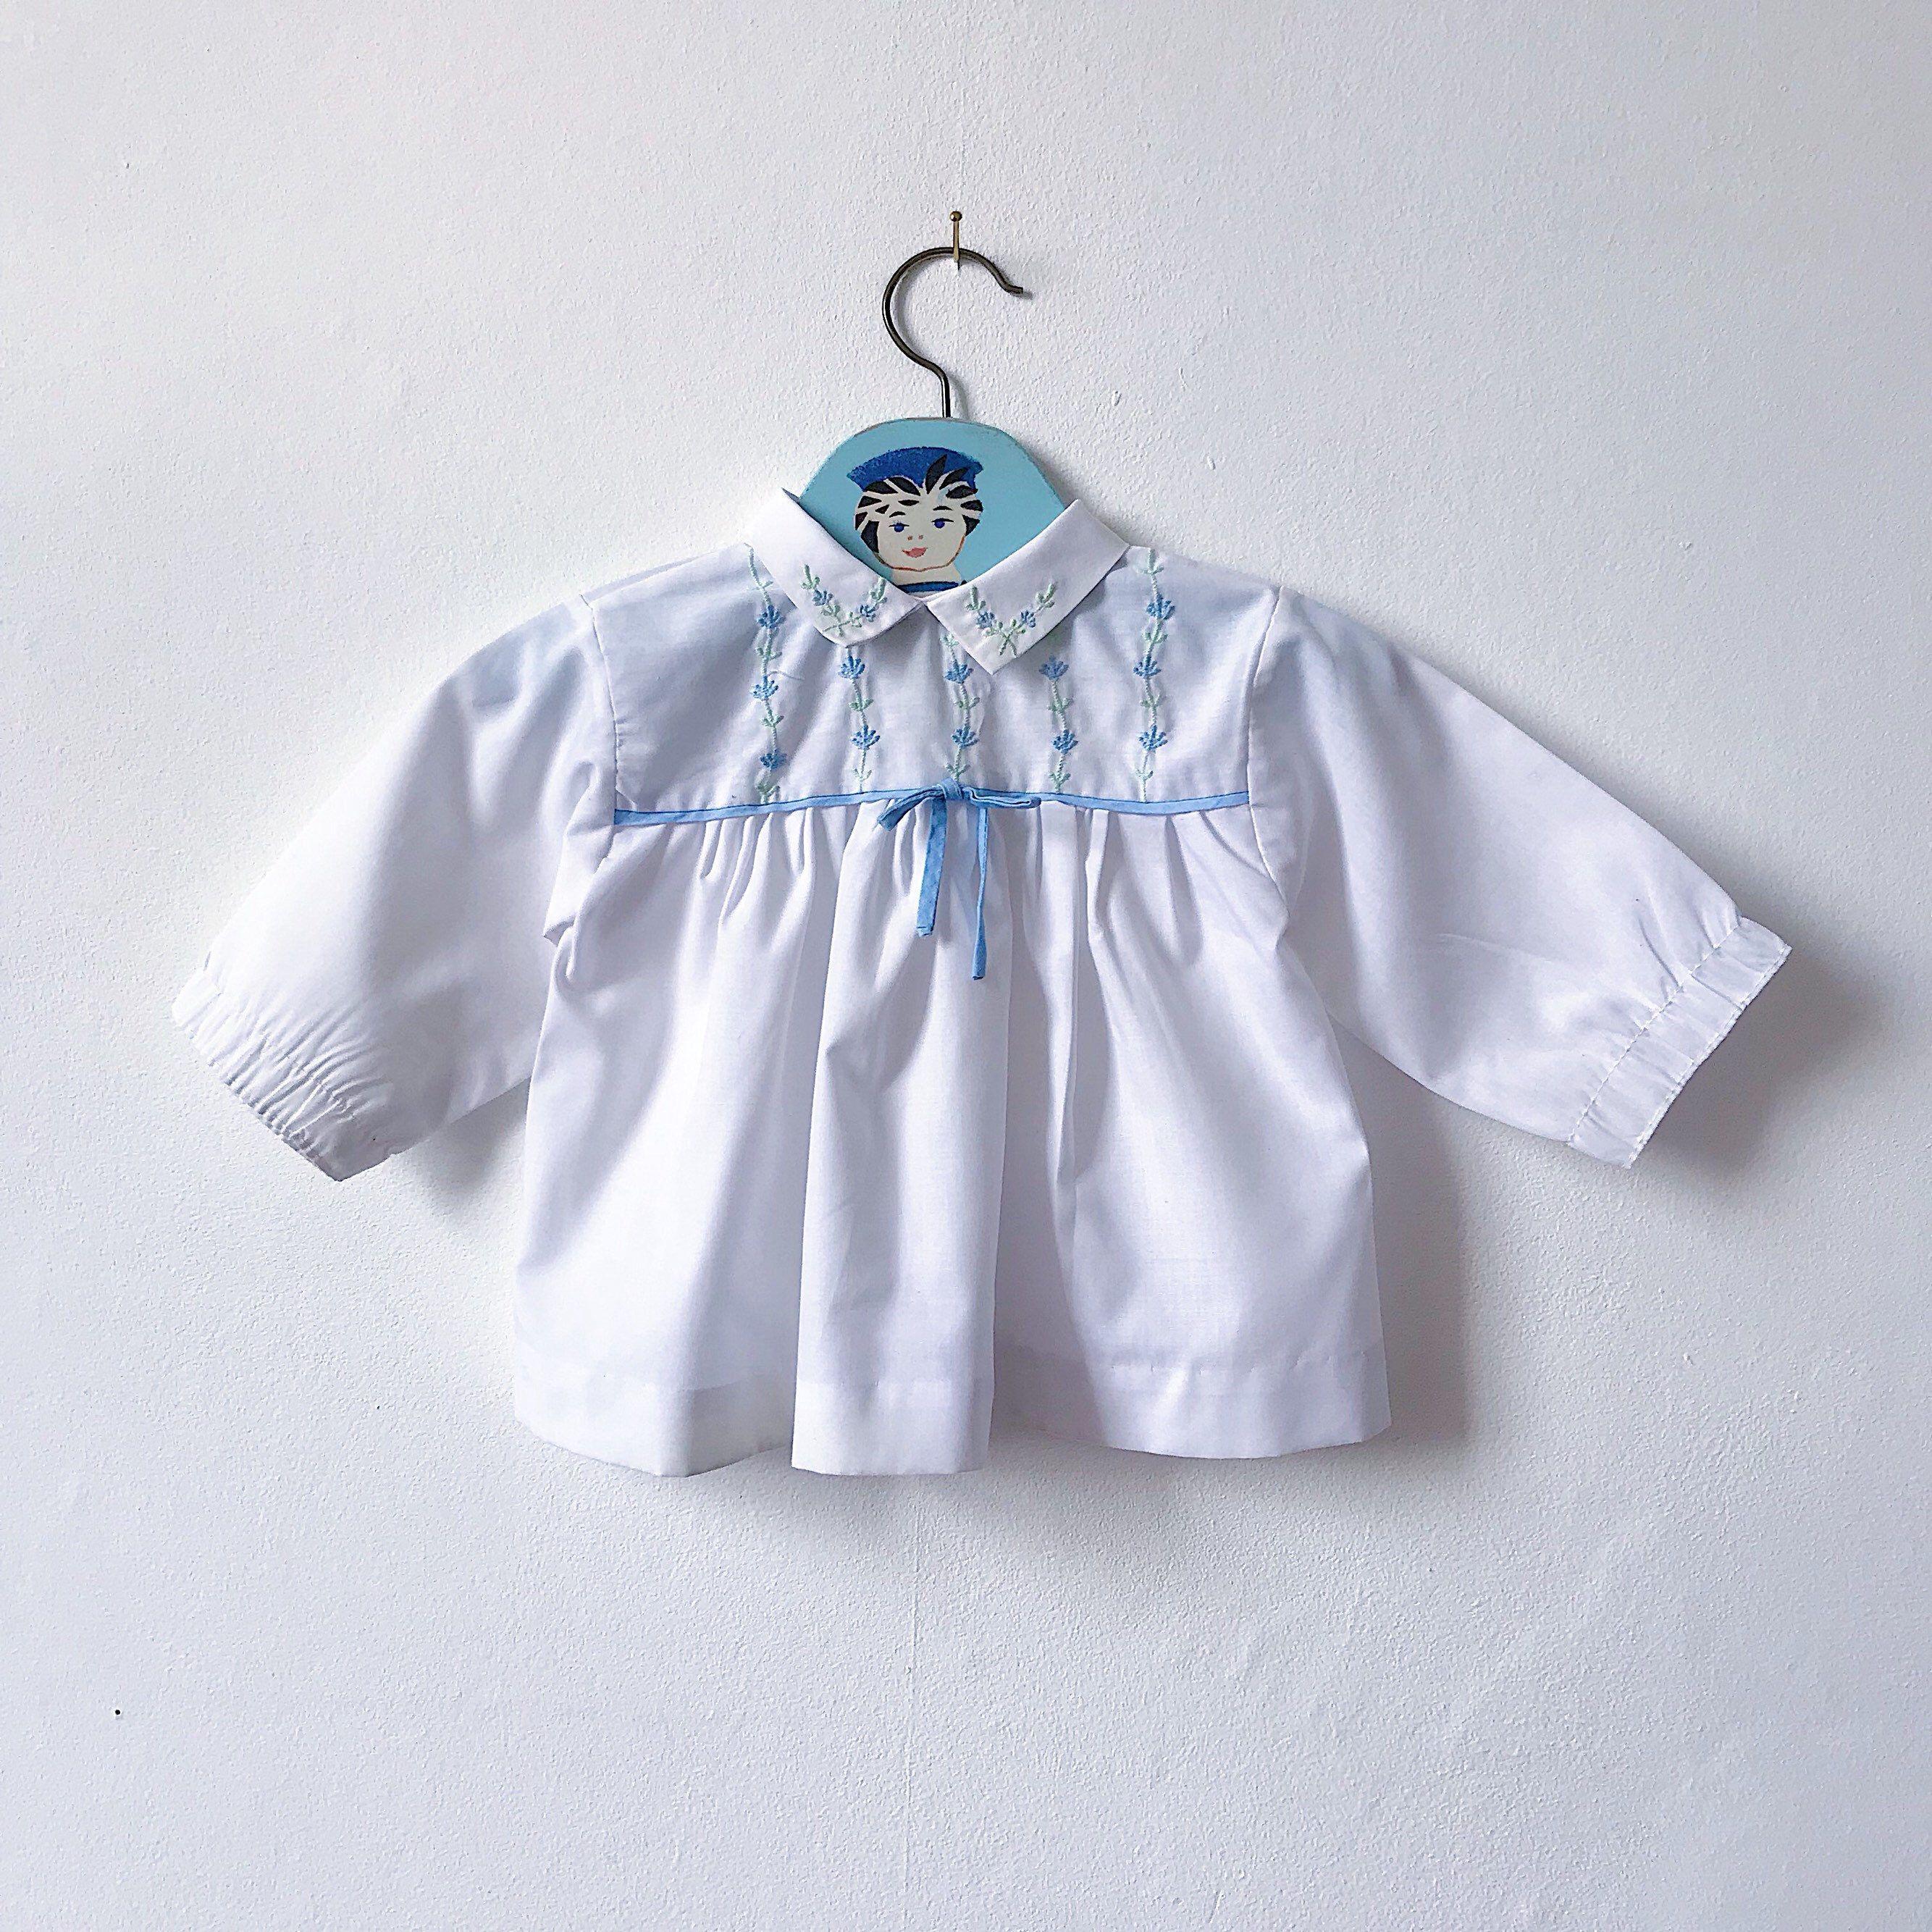 67634f518dfa Vintage baby dress